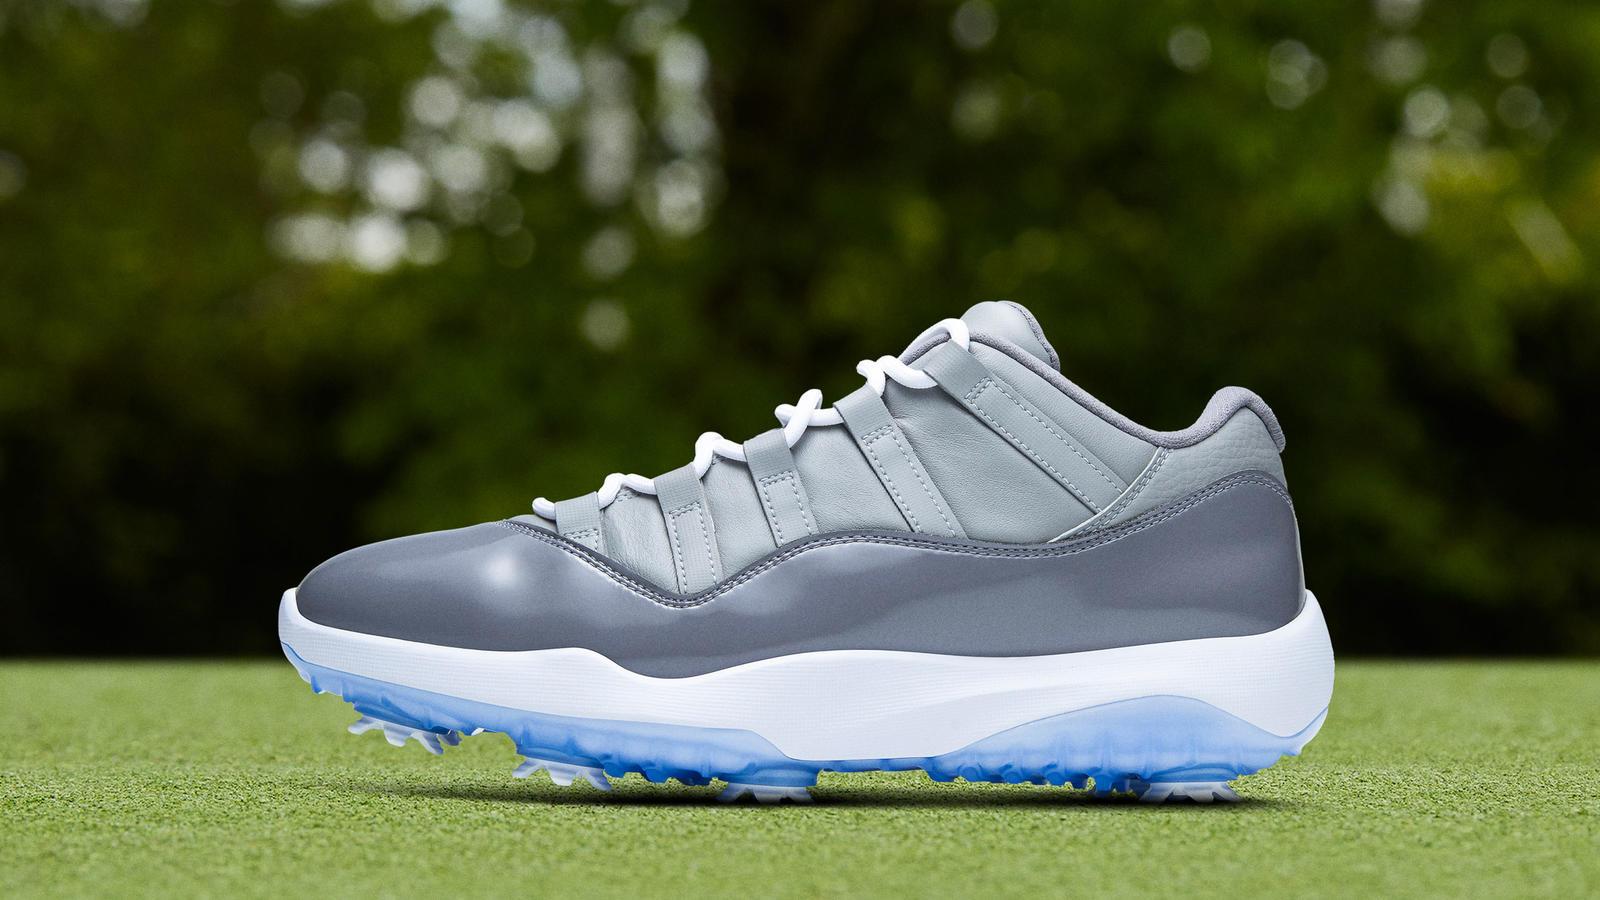 Jordan 11 Cool Grey Golf 1600x900 Wallpaper Teahub Io